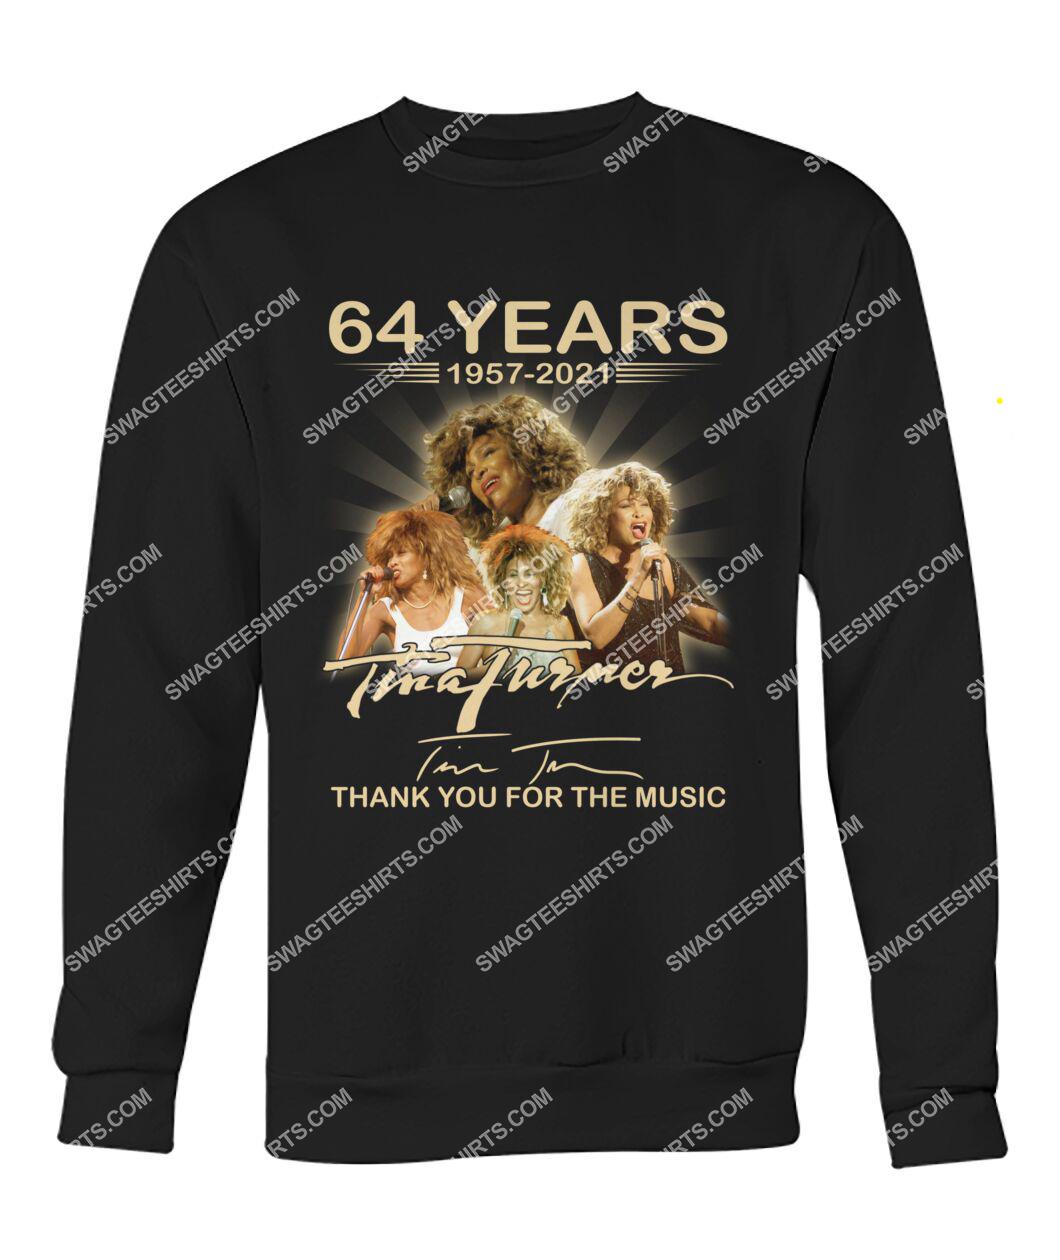 tina turner 64 years thank you for the music signature sweatshirt 1